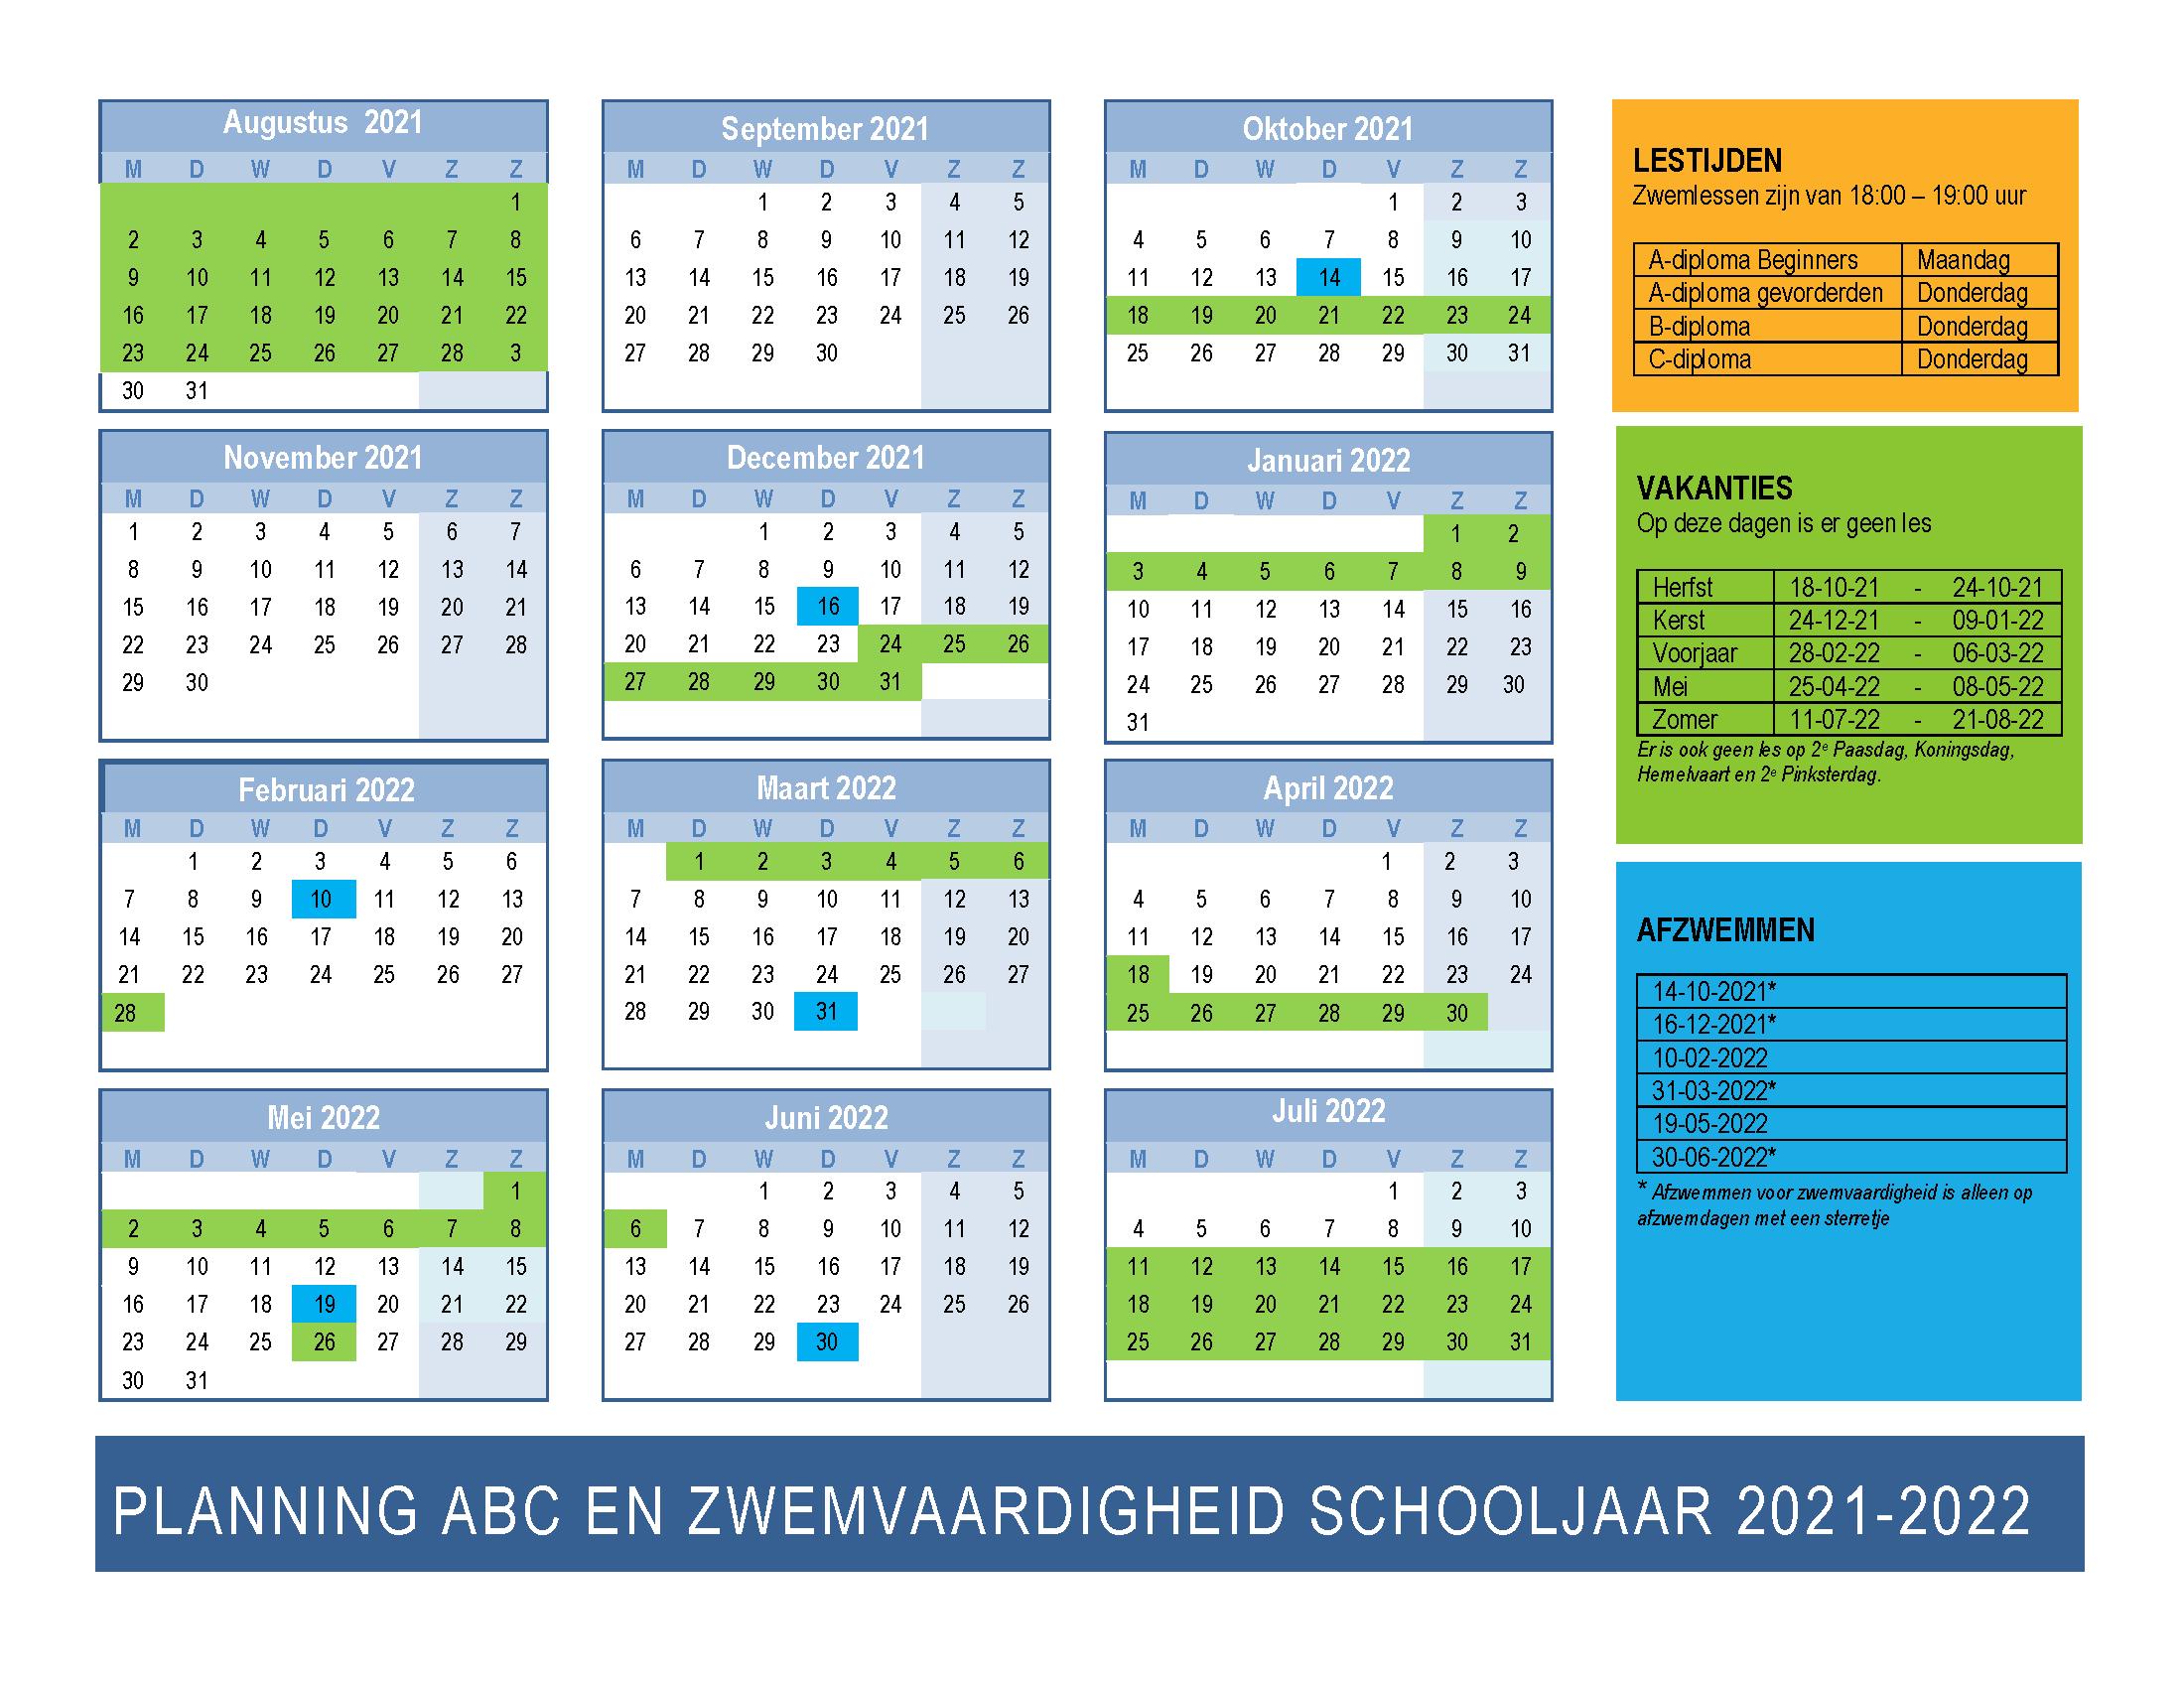 Planning ABC zwemmen en zwemvaardigheid 2021-2022 Zwemclub Zeist